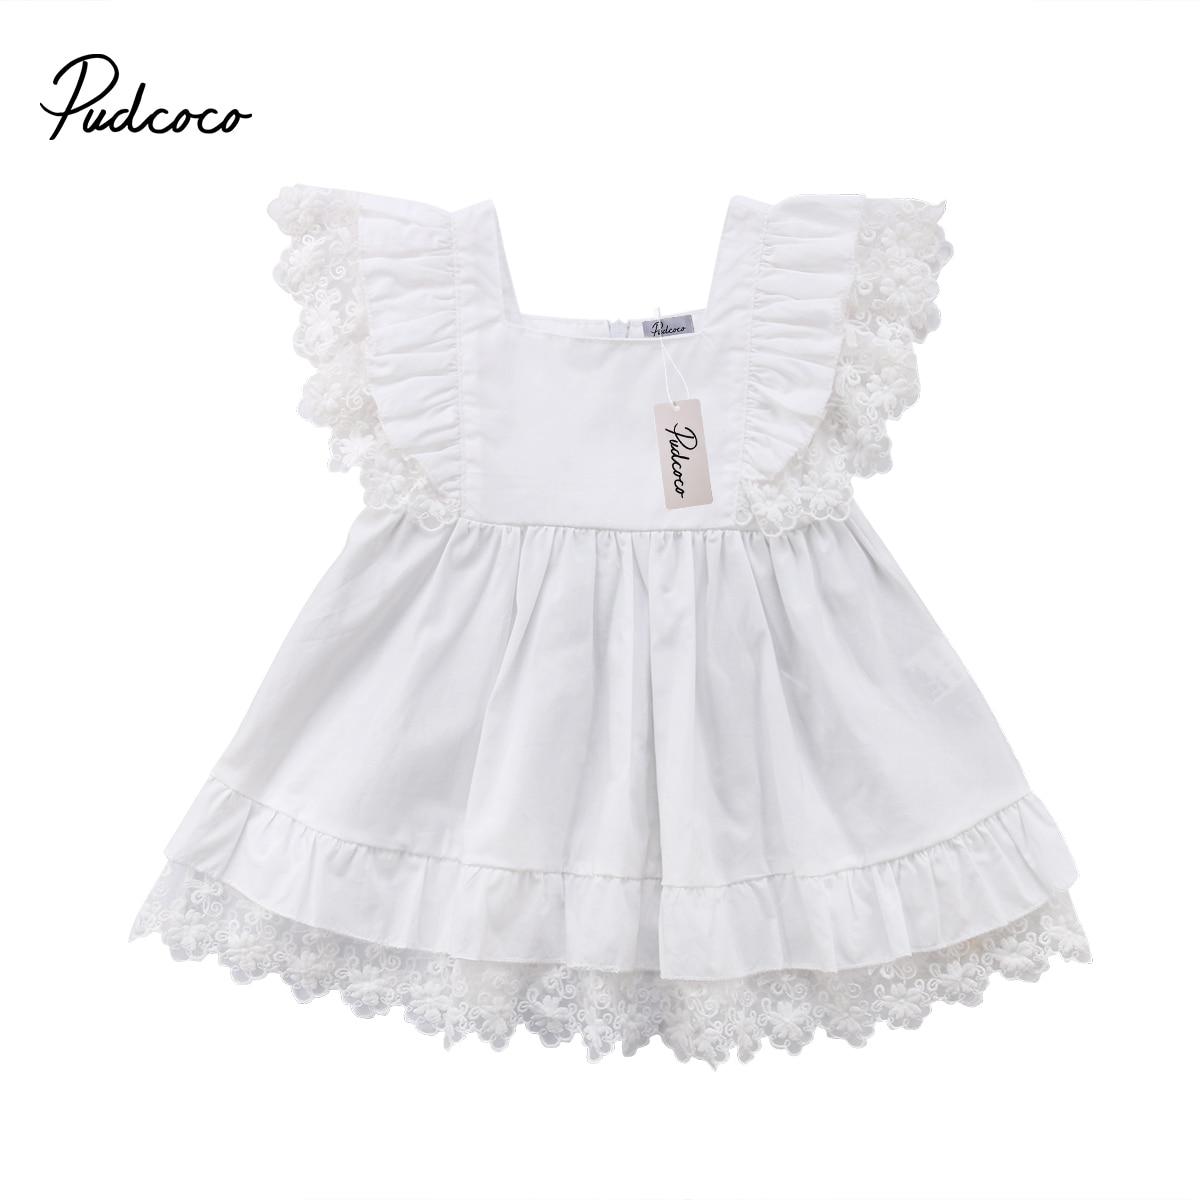 Beautiful Toddler Dress Newborn Kids Baby Girls Princess White Lace Dress Pageant Party Dresses day dress